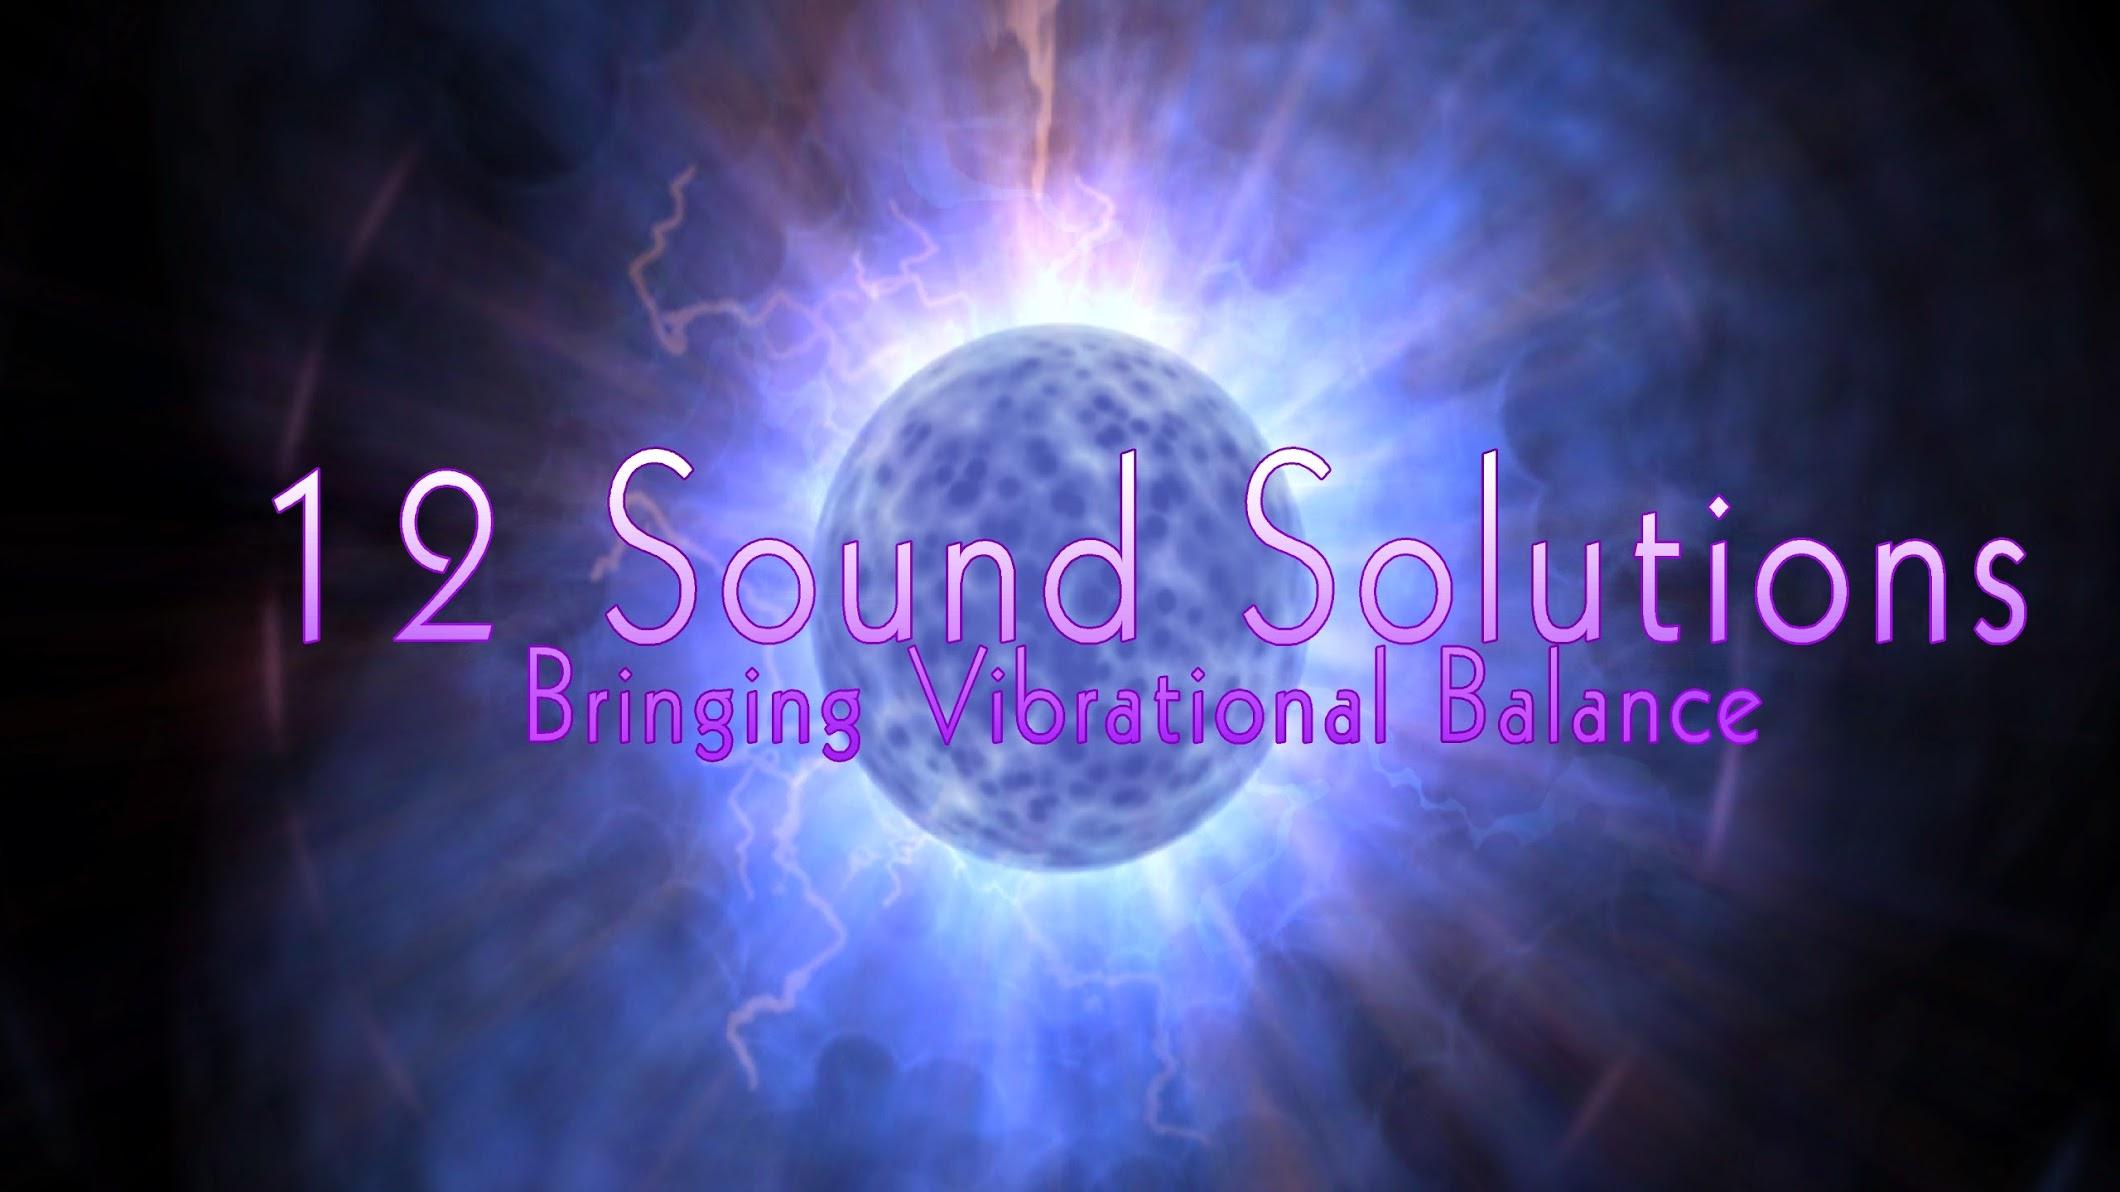 12soundsolutions